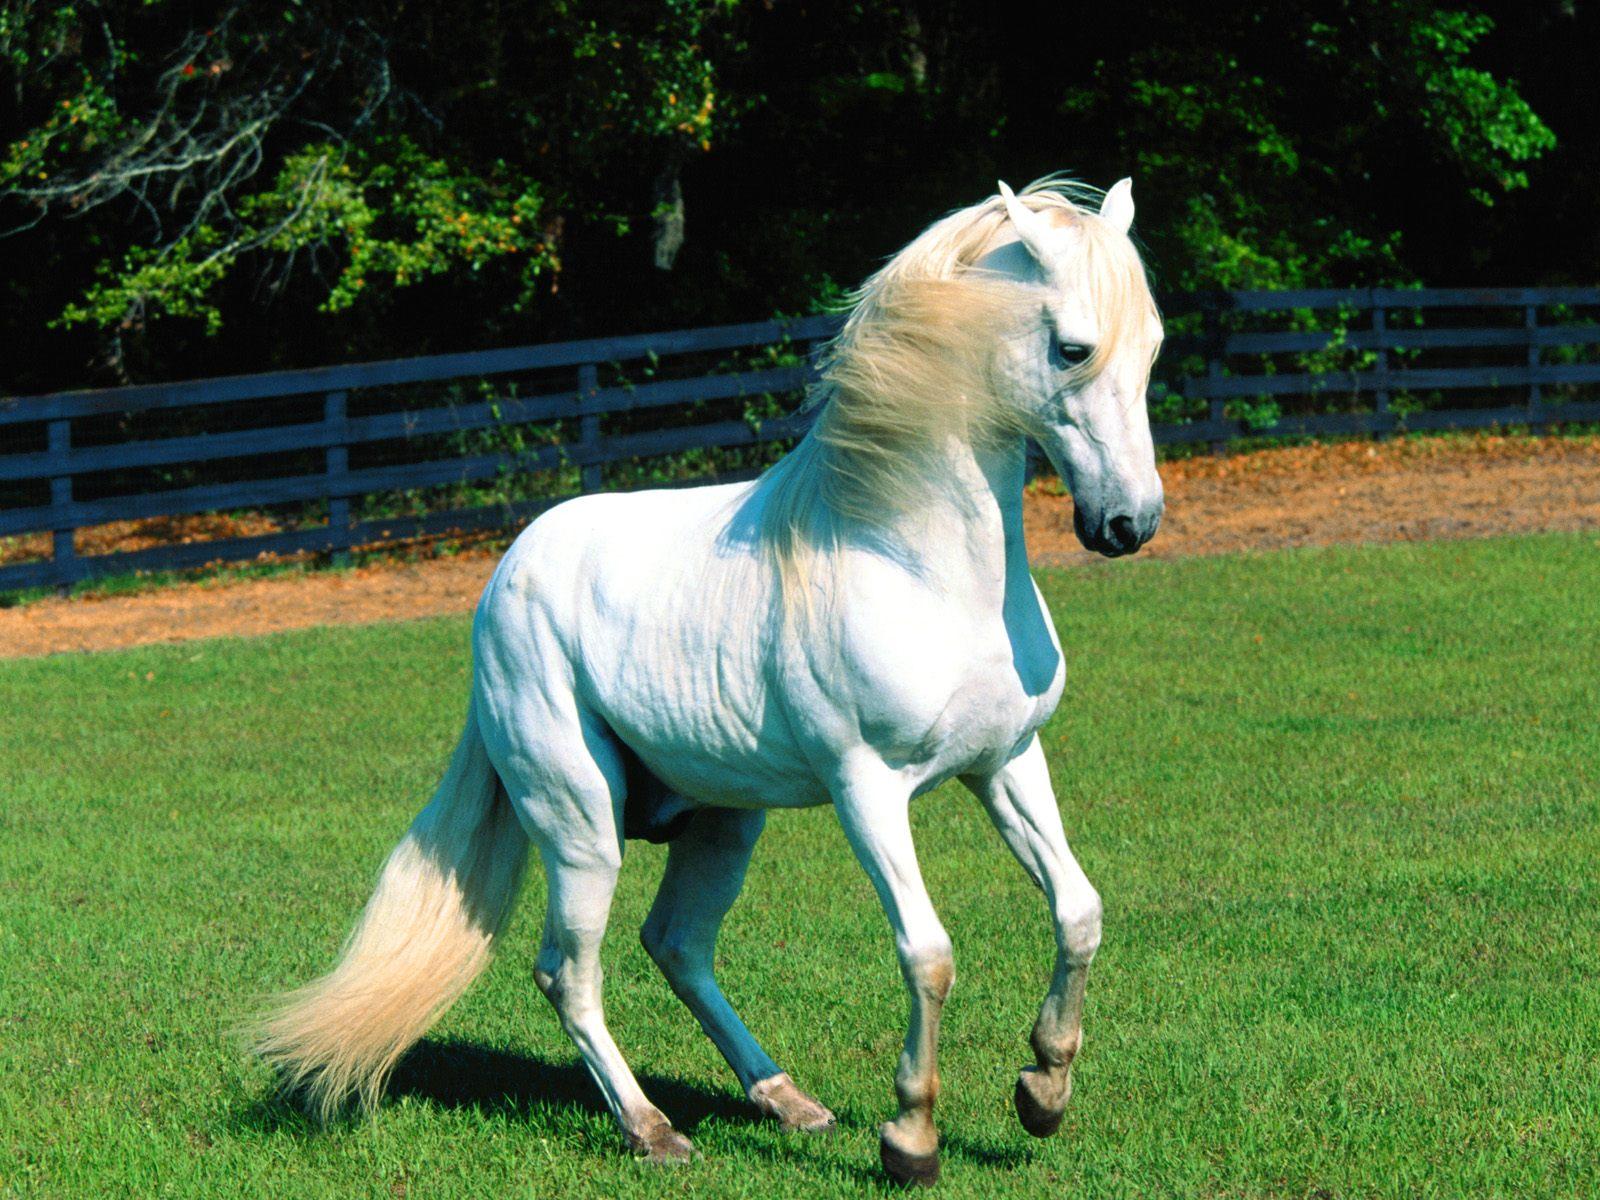 12 White Horses Desktop Wallpapers Download 1600x1200